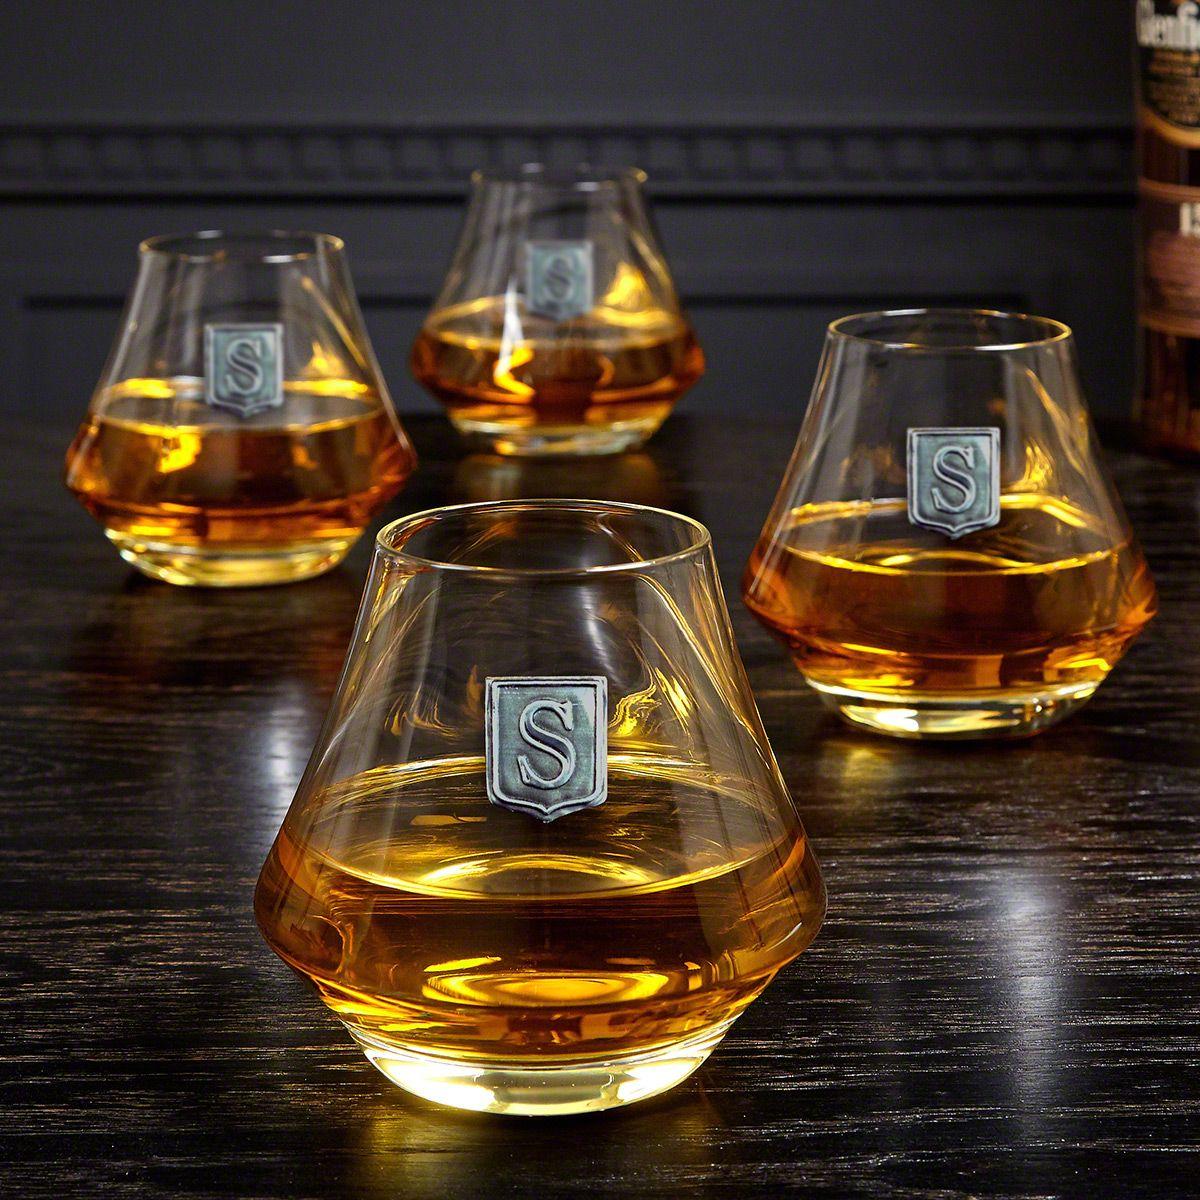 DiMera Regal Crested Whiskey Glasses, Set of 4